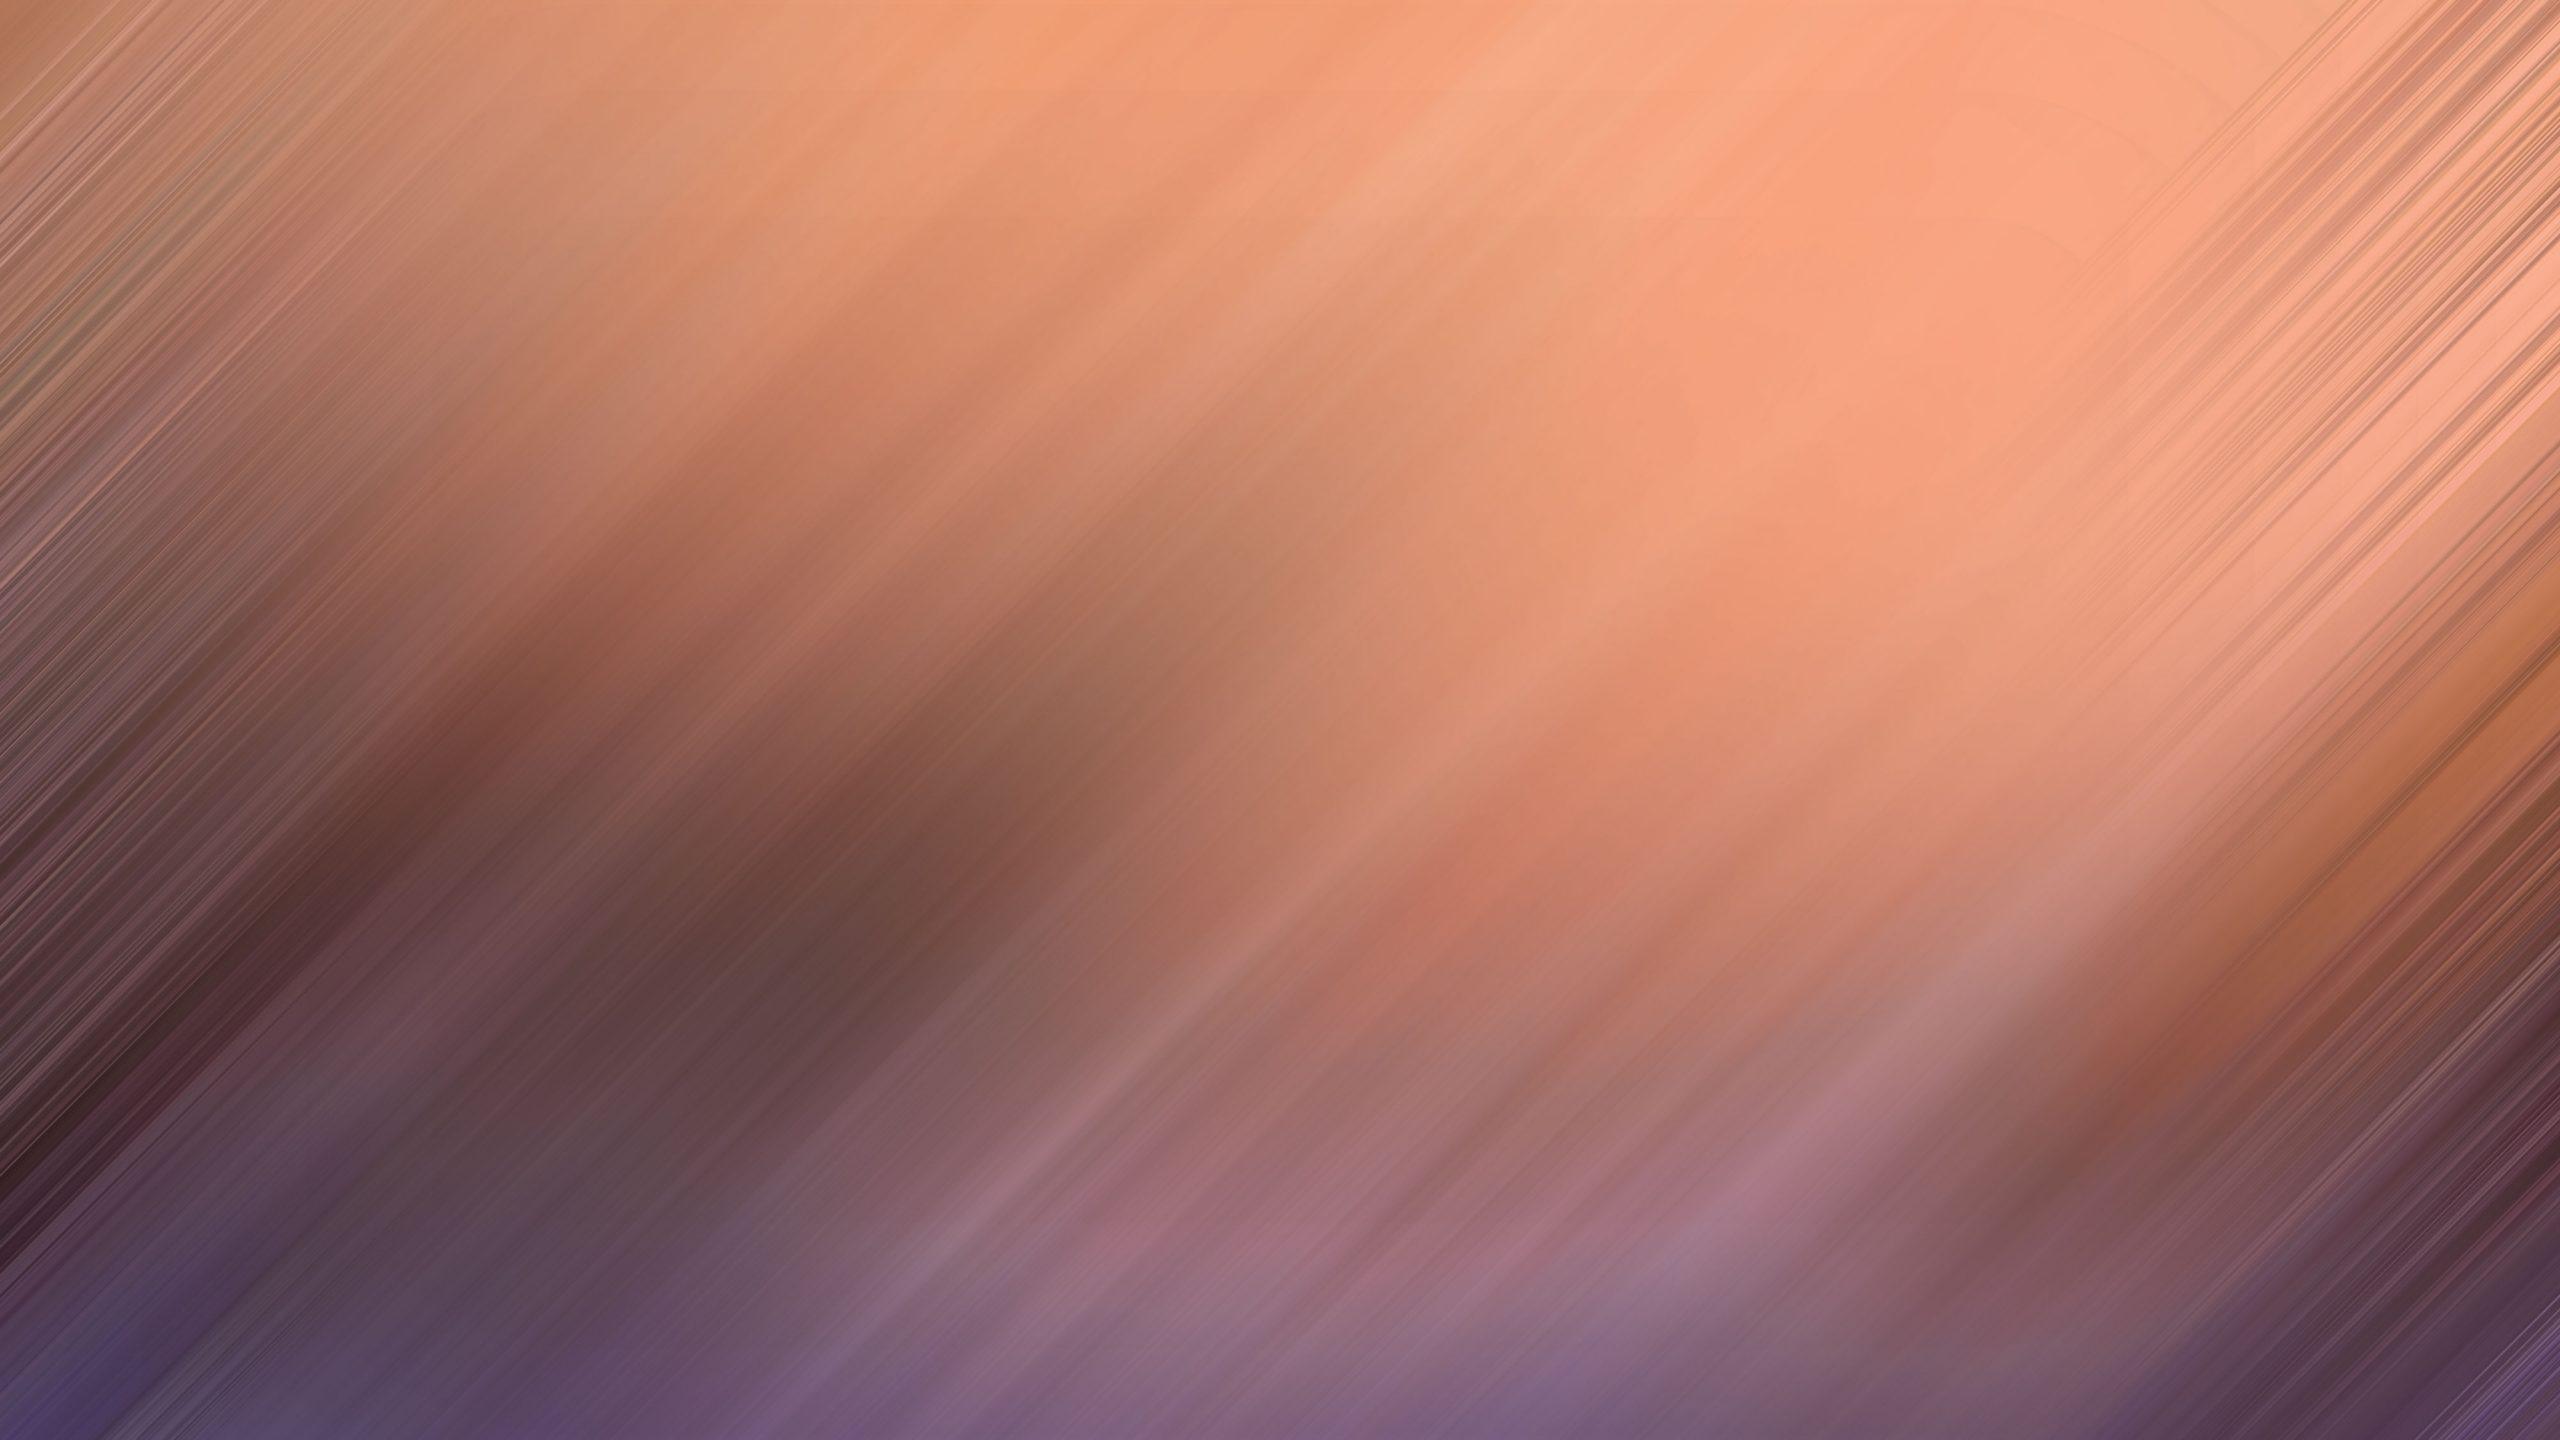 Creamy color abstract wallpaper